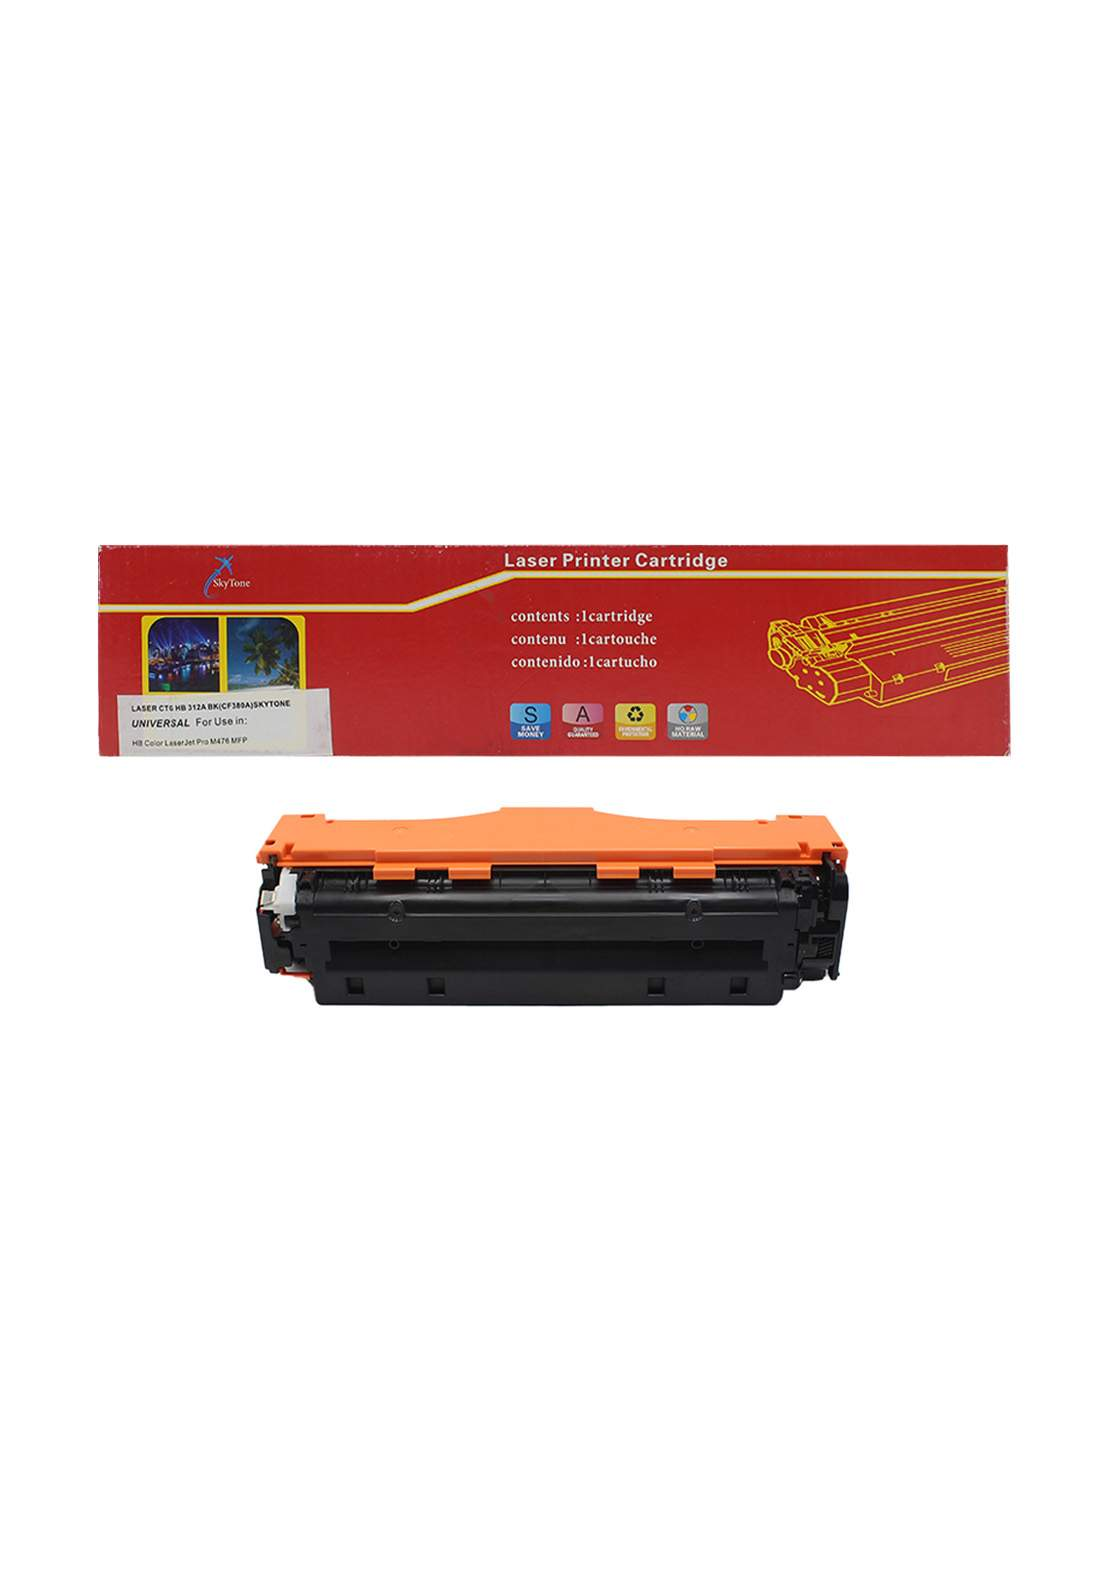 SKYTONE CTG HP 312A (CF380A) Universal Laser Printer Toner Cartridge خرطوشة حبر